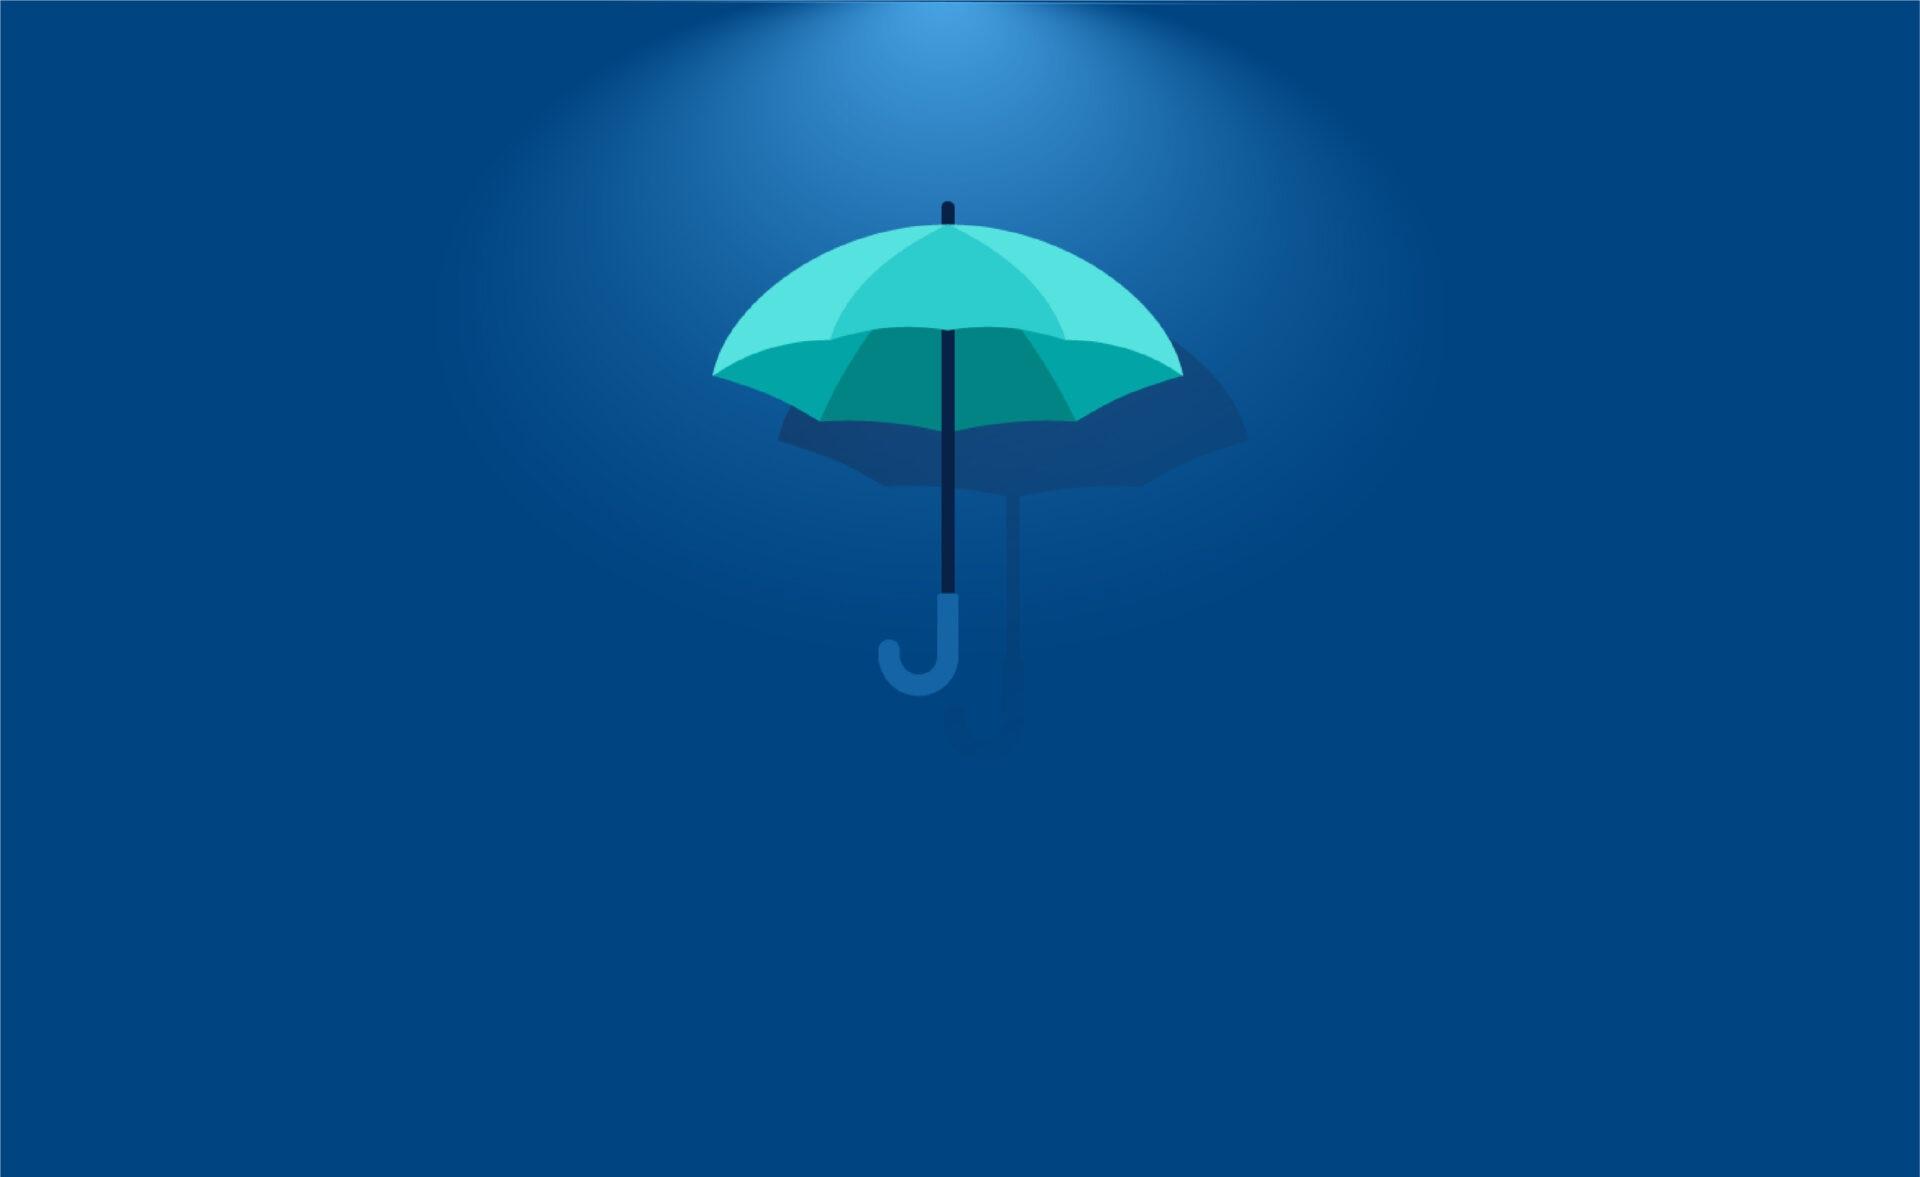 insurtech-seguros-innovacion-bbva